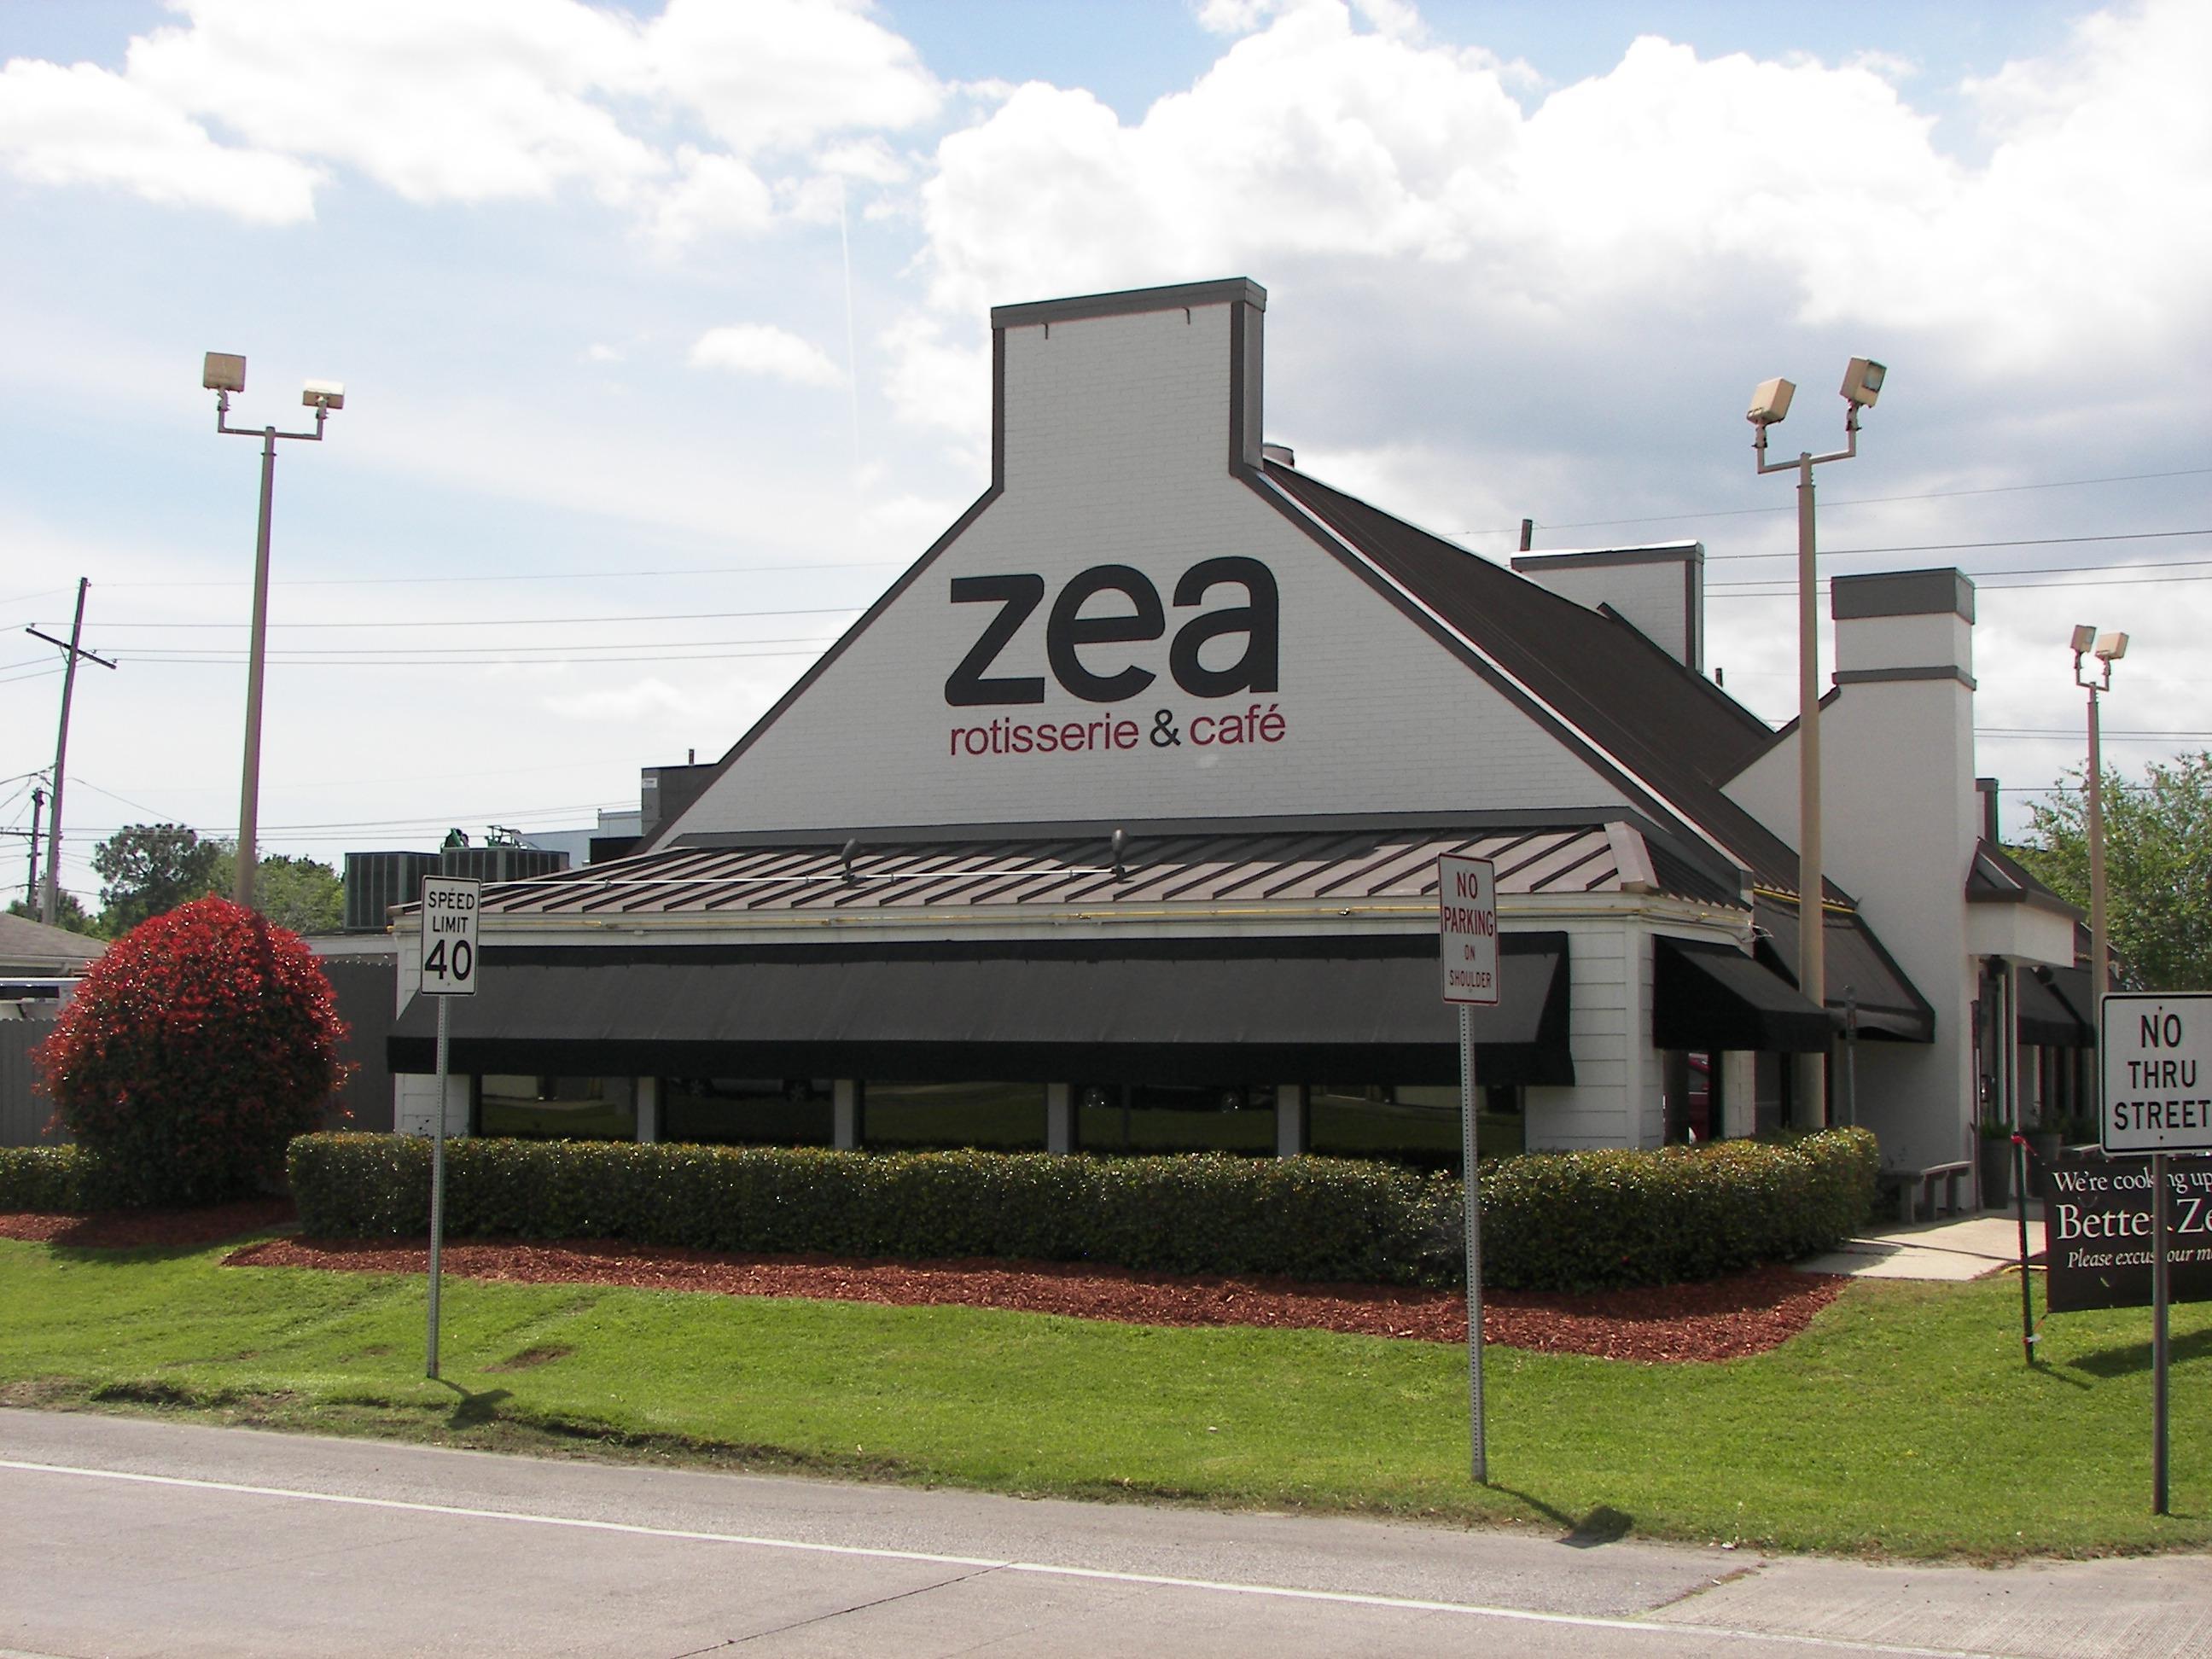 Zea Rotisserie & Cafe